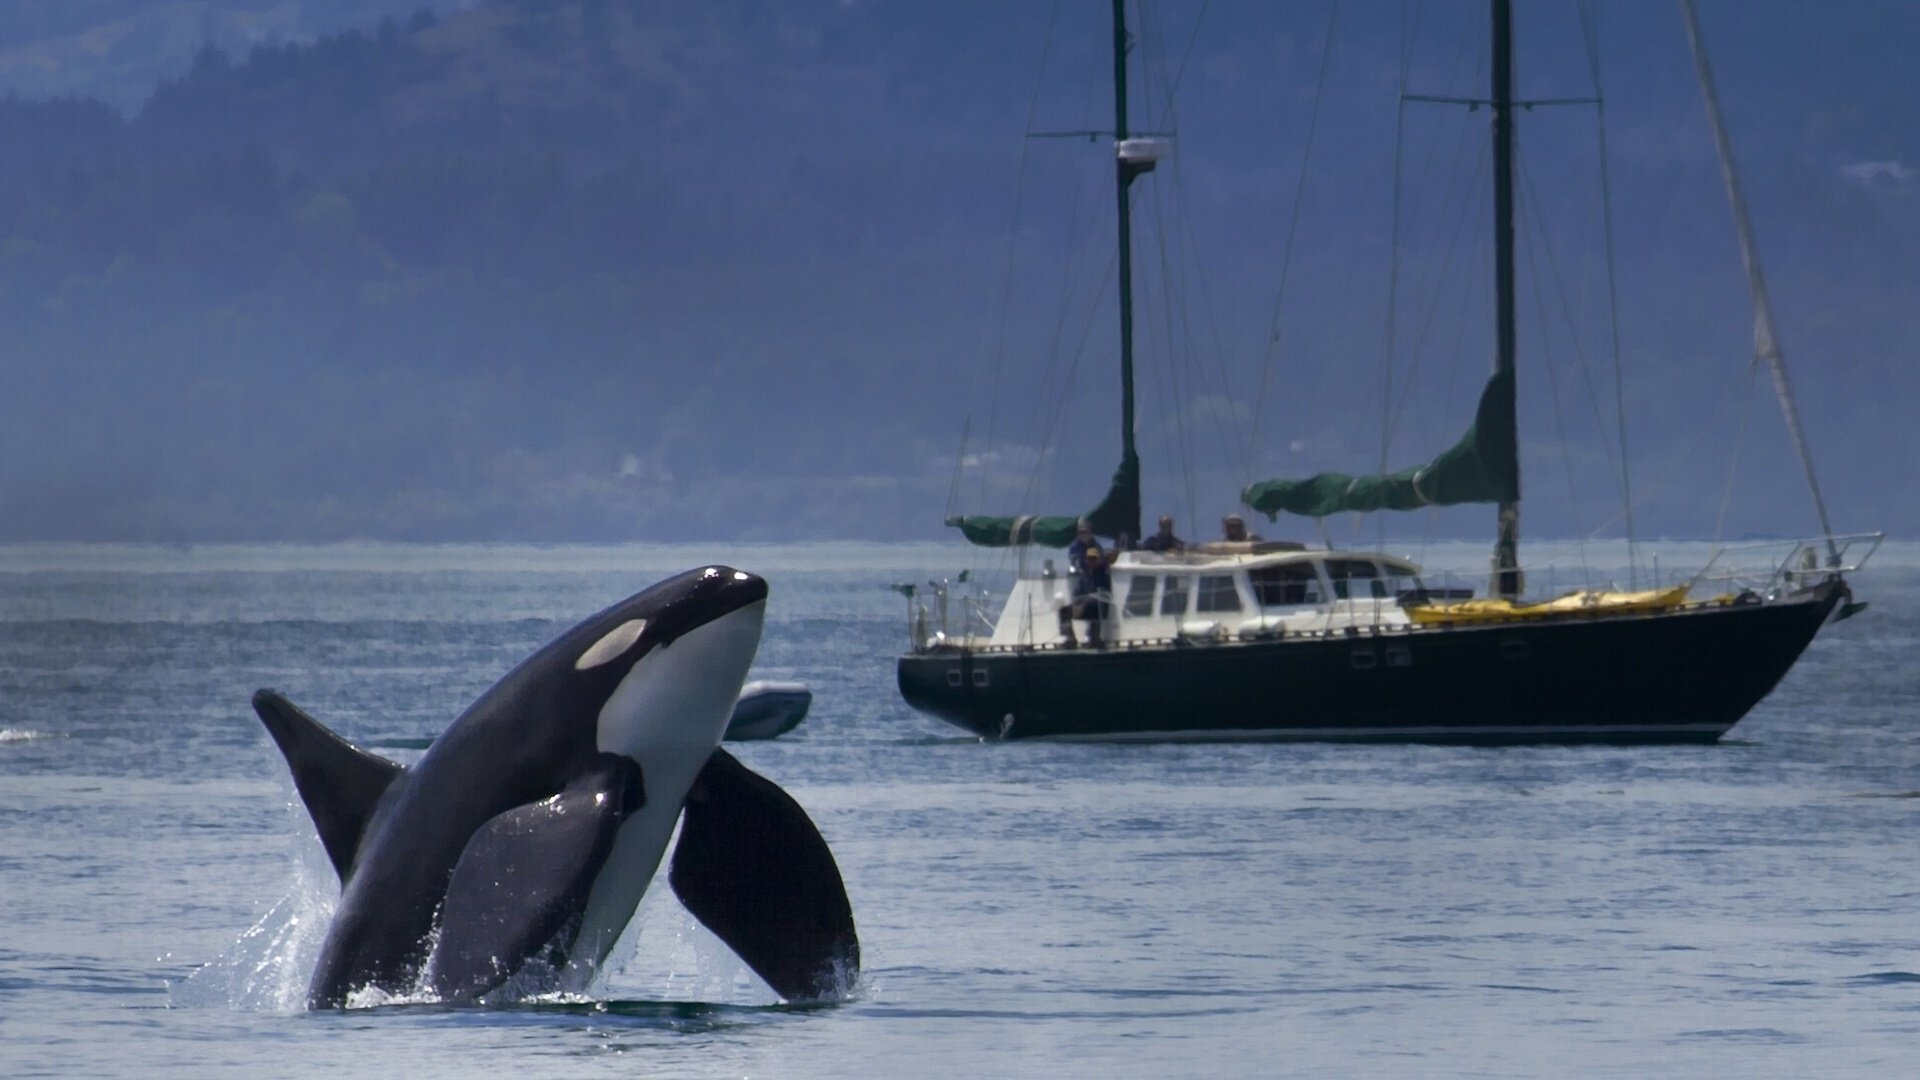 Killer whale yacht orca ship boat wallpaper 1920x1080 467060 1920x1080